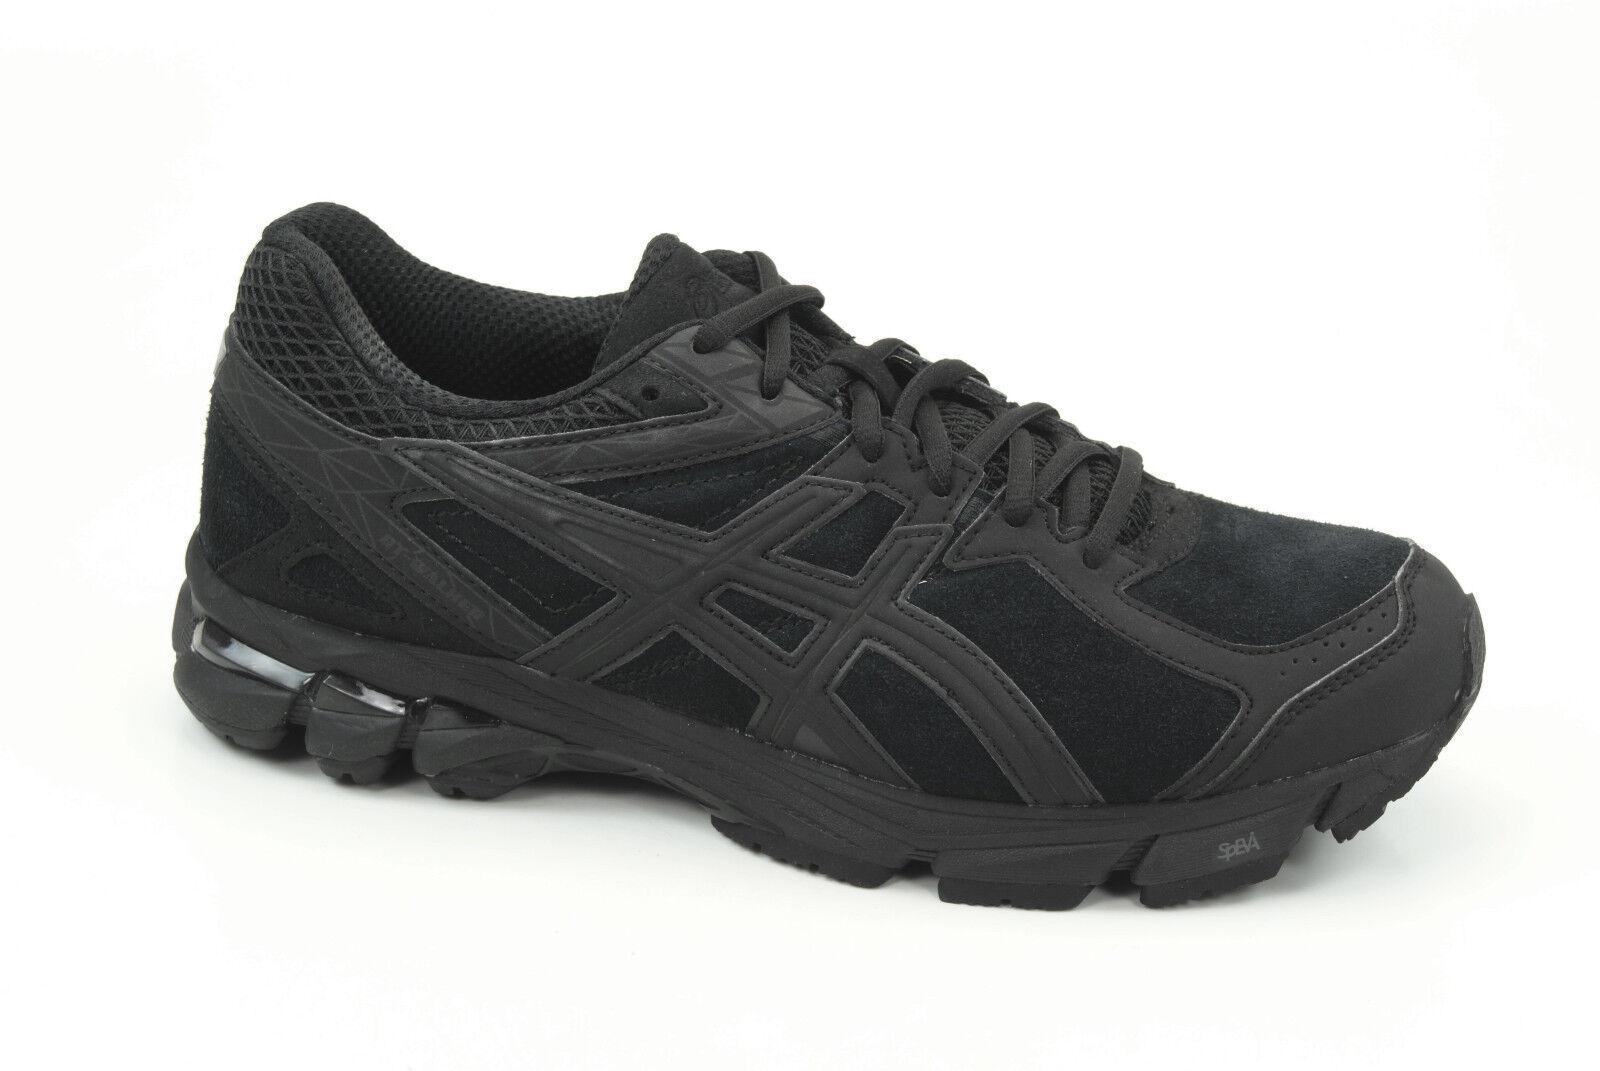 Asics Gel gt-walker Walking Shoes Outdoor Shoes Ladies Hiking Shoes q55nk-9090 Cheap and beautiful fashion